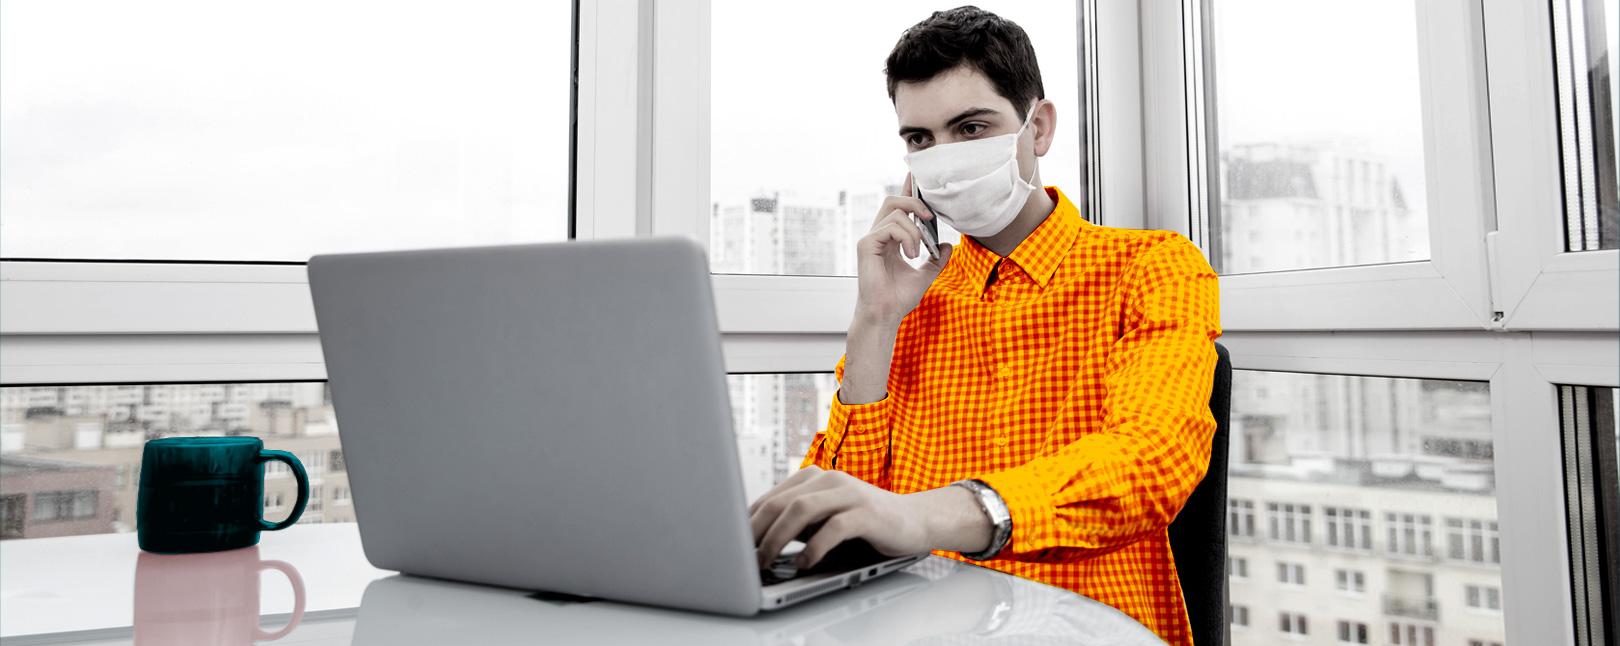 online shopping coronavirus ecommerce man